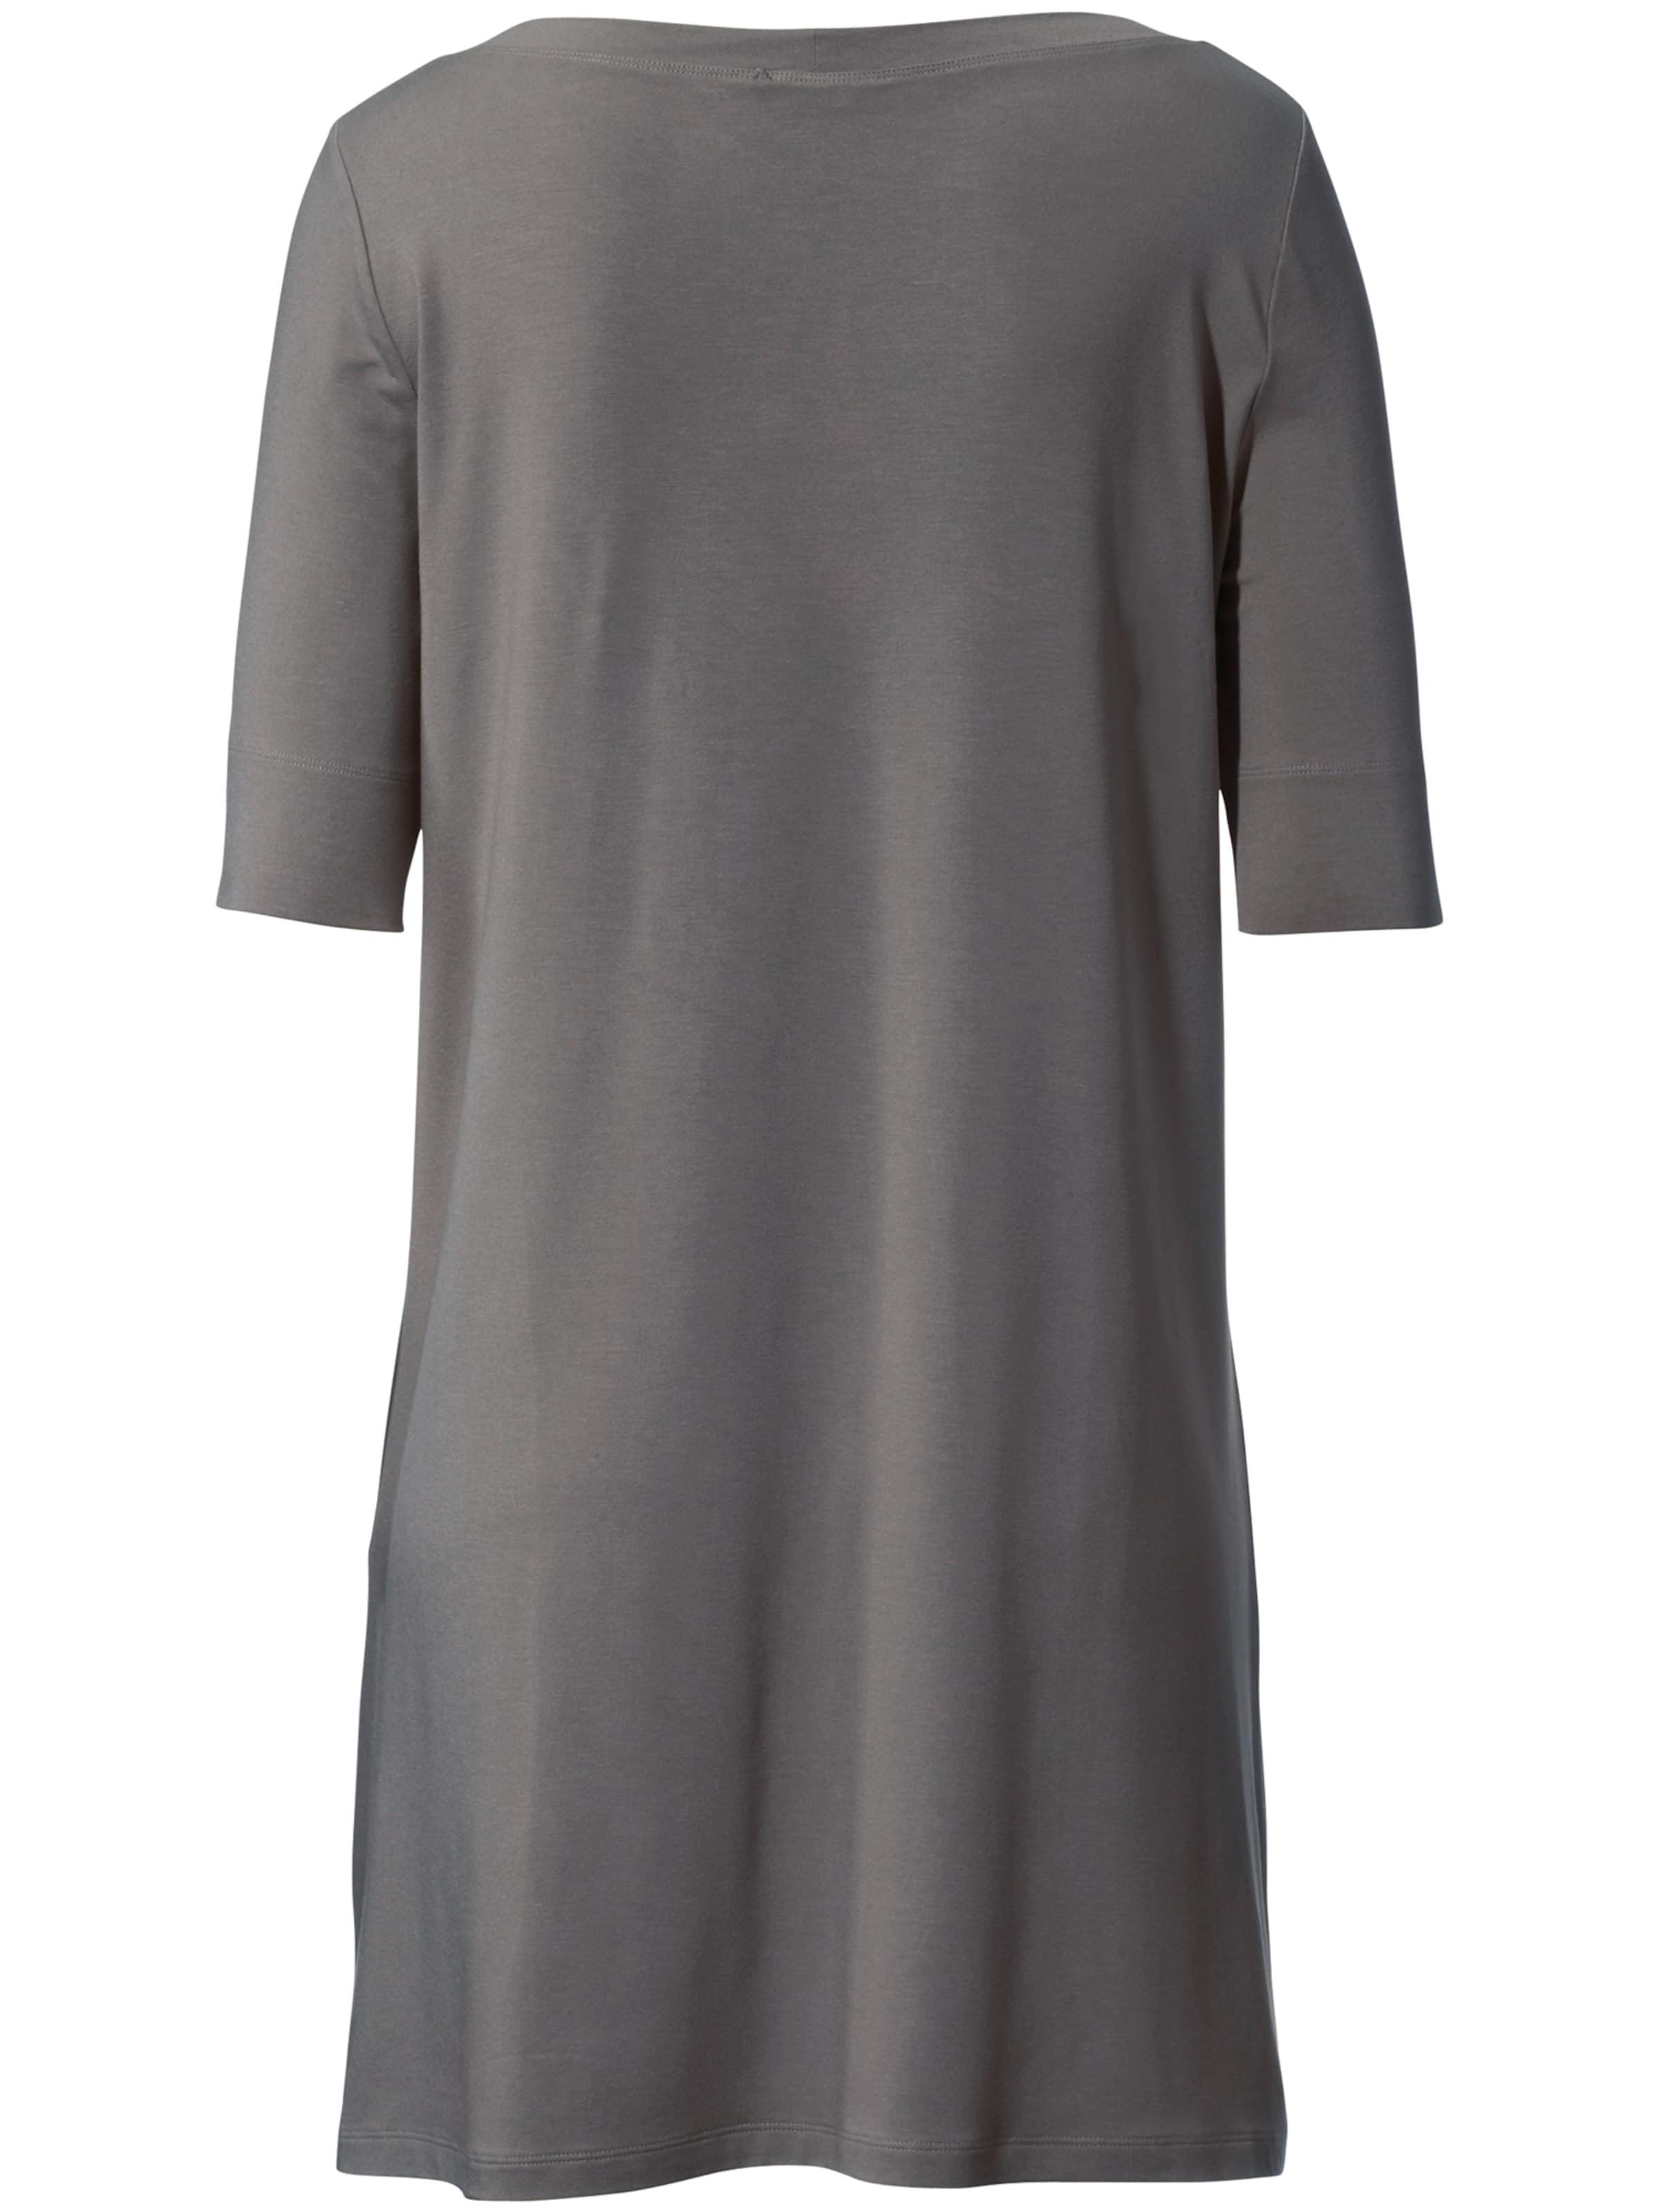 Aura Jersey shirt In Taupe Anna l1TFJcK